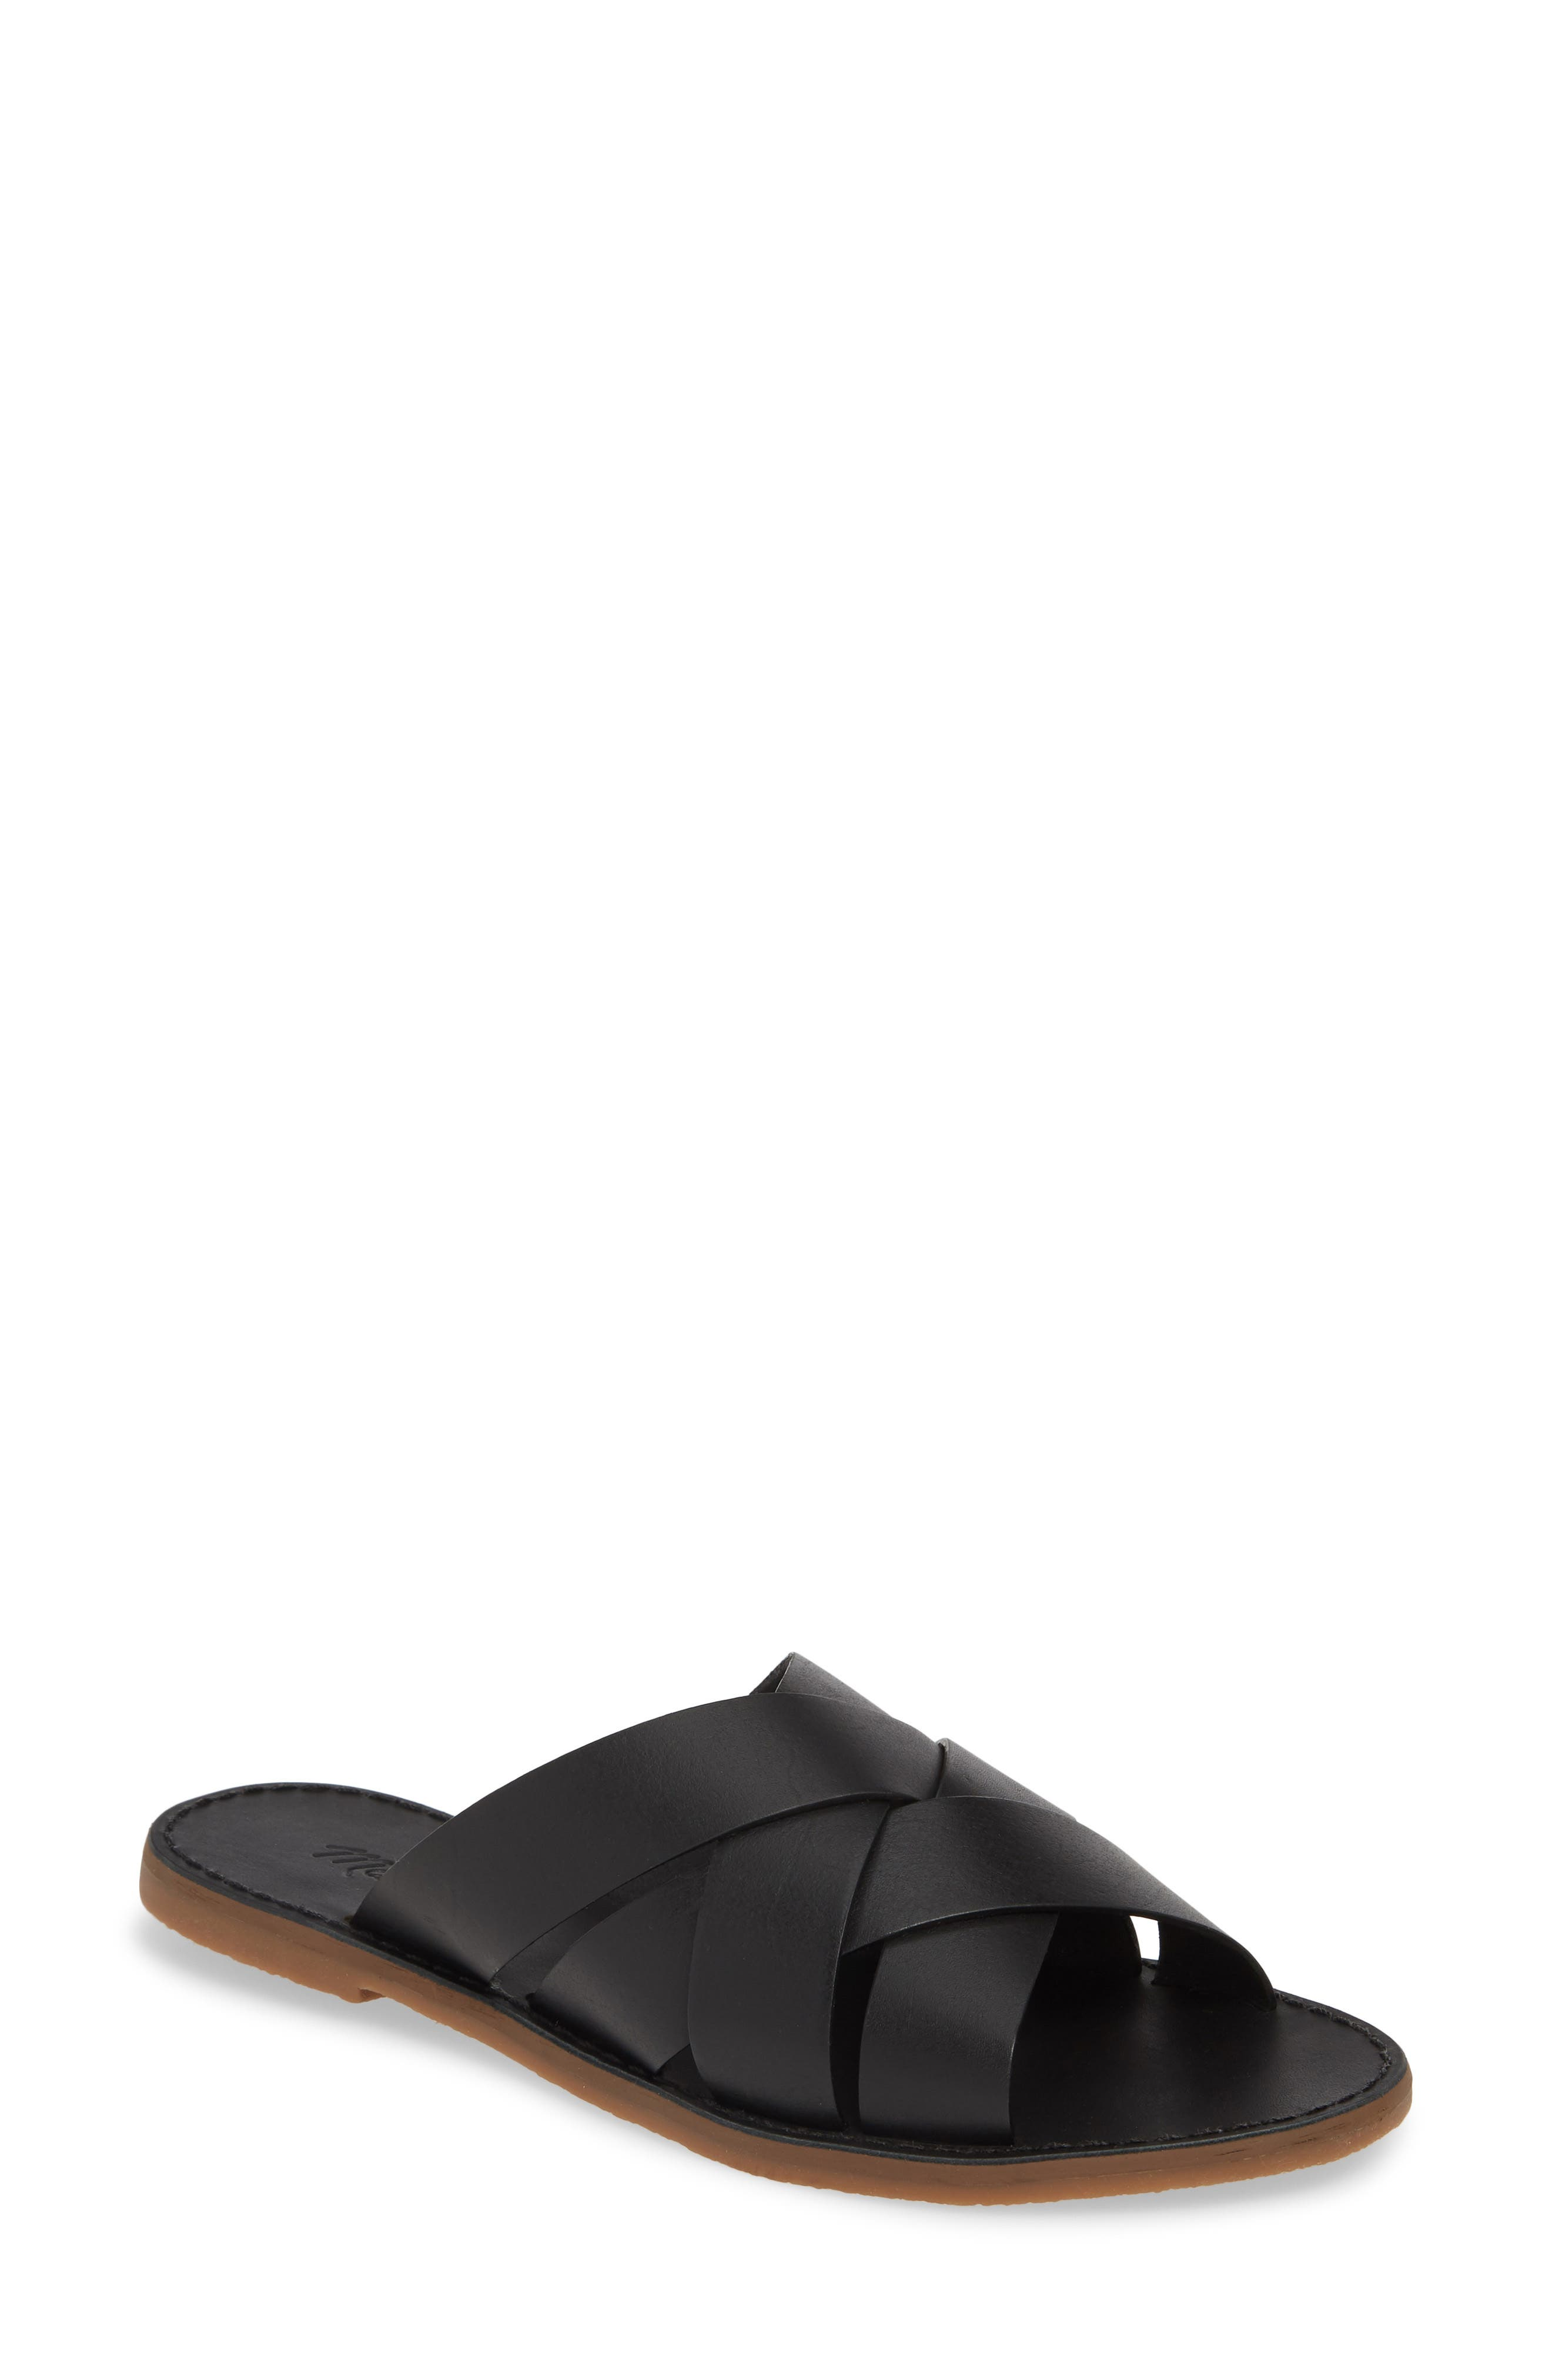 MADEWELL, The Boardwalk Woven Slide Sandal, Main thumbnail 1, color, TRUE BLACK